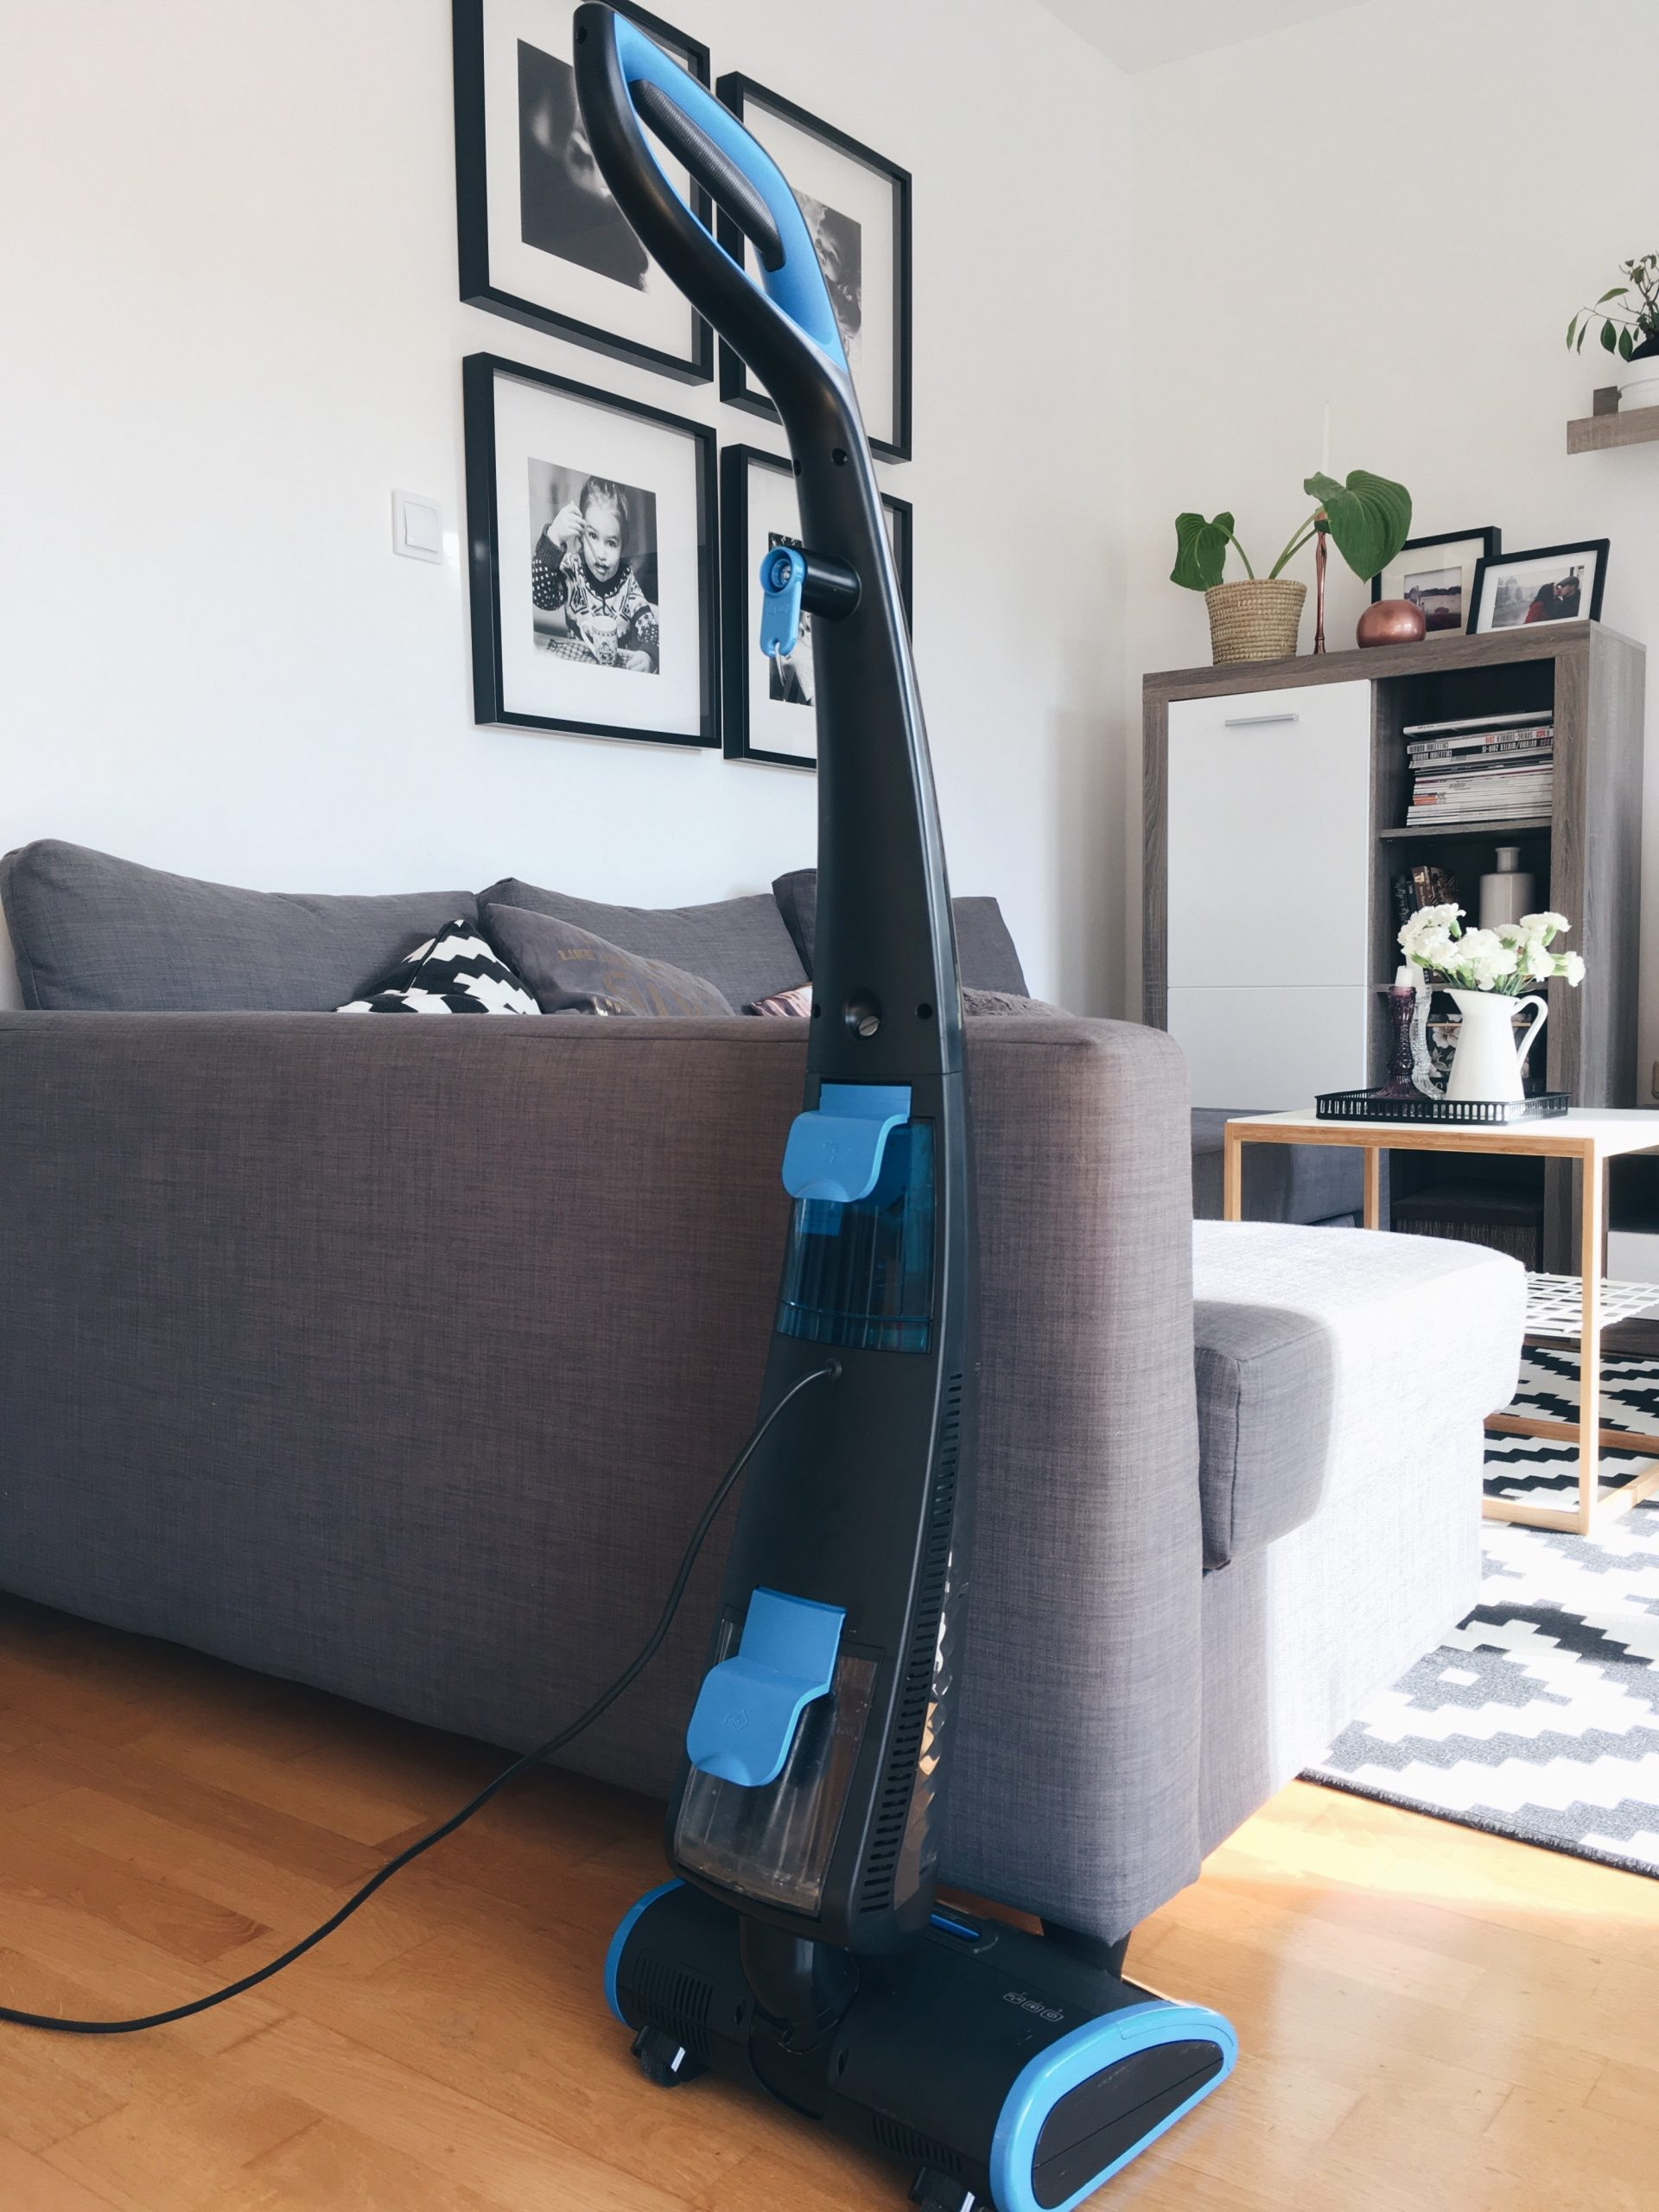 philips aquatrio pro usisvač vacuum cleaner more less ines cleaning čišćenje my home home decor interiors interior lifestyle mama blogerica momblogger lifestyleblogger ikea hrvatska